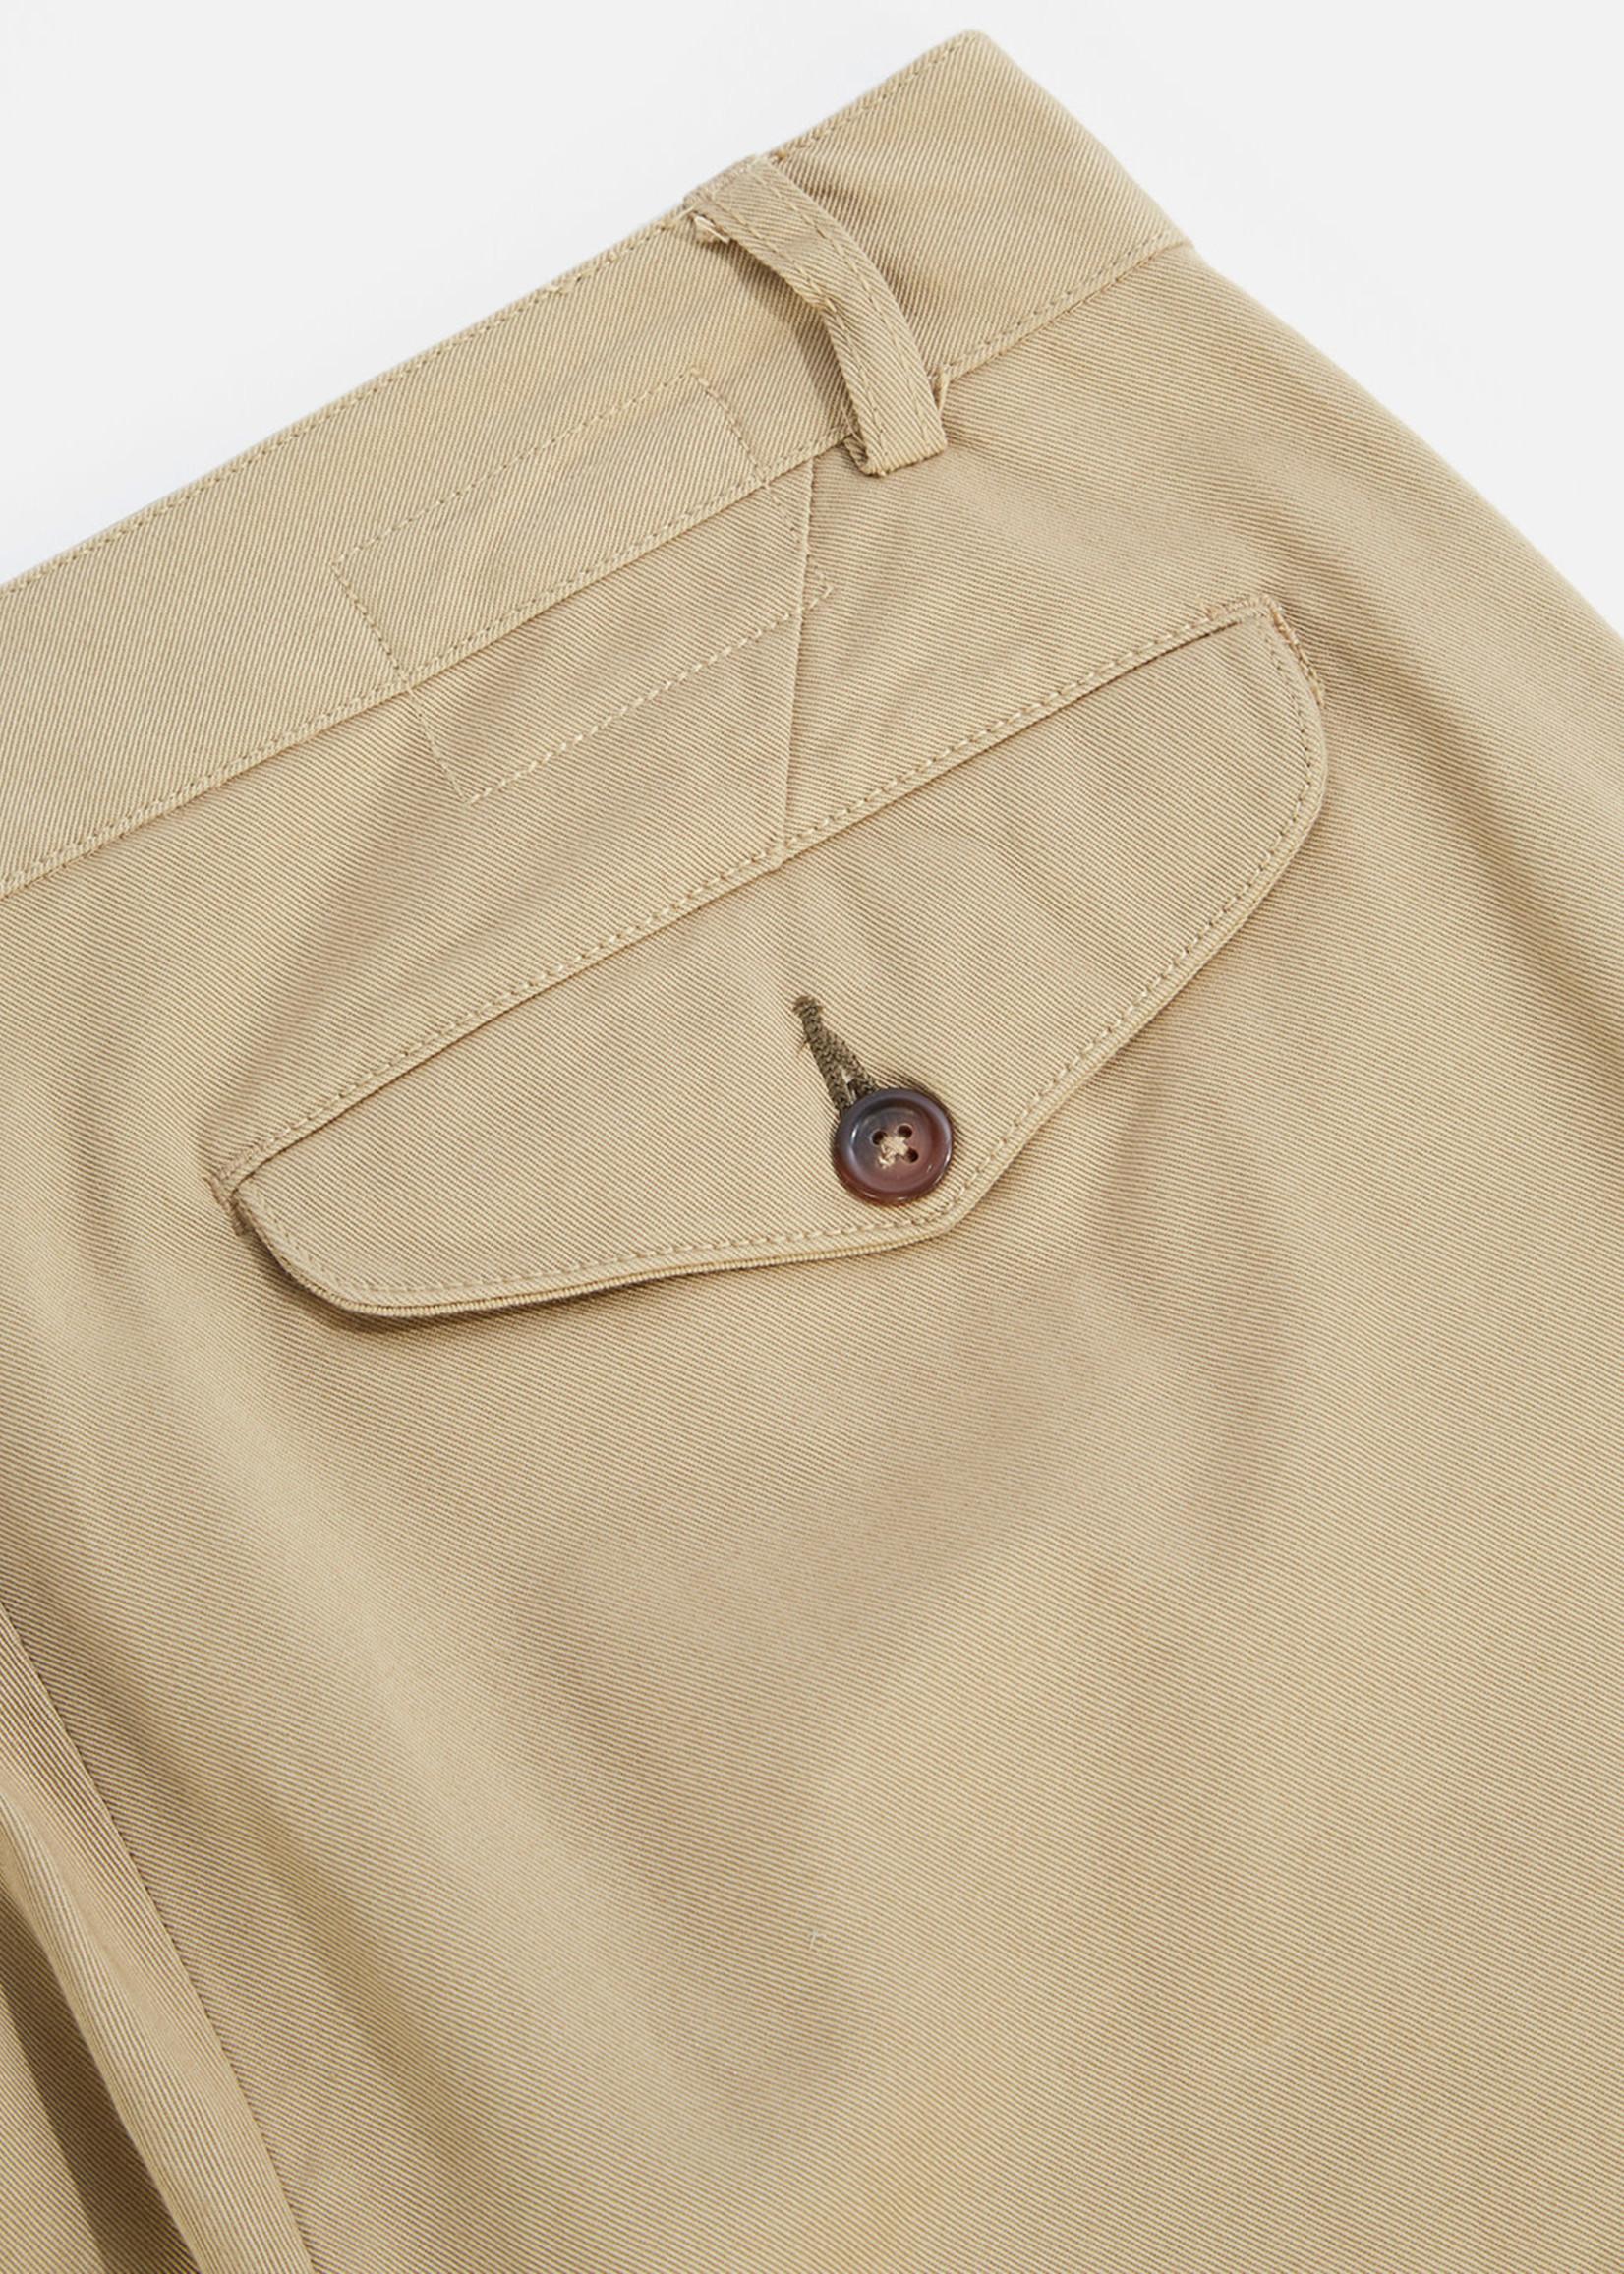 Universal Works Universal Works Aston Pant Tan Cotton Twill